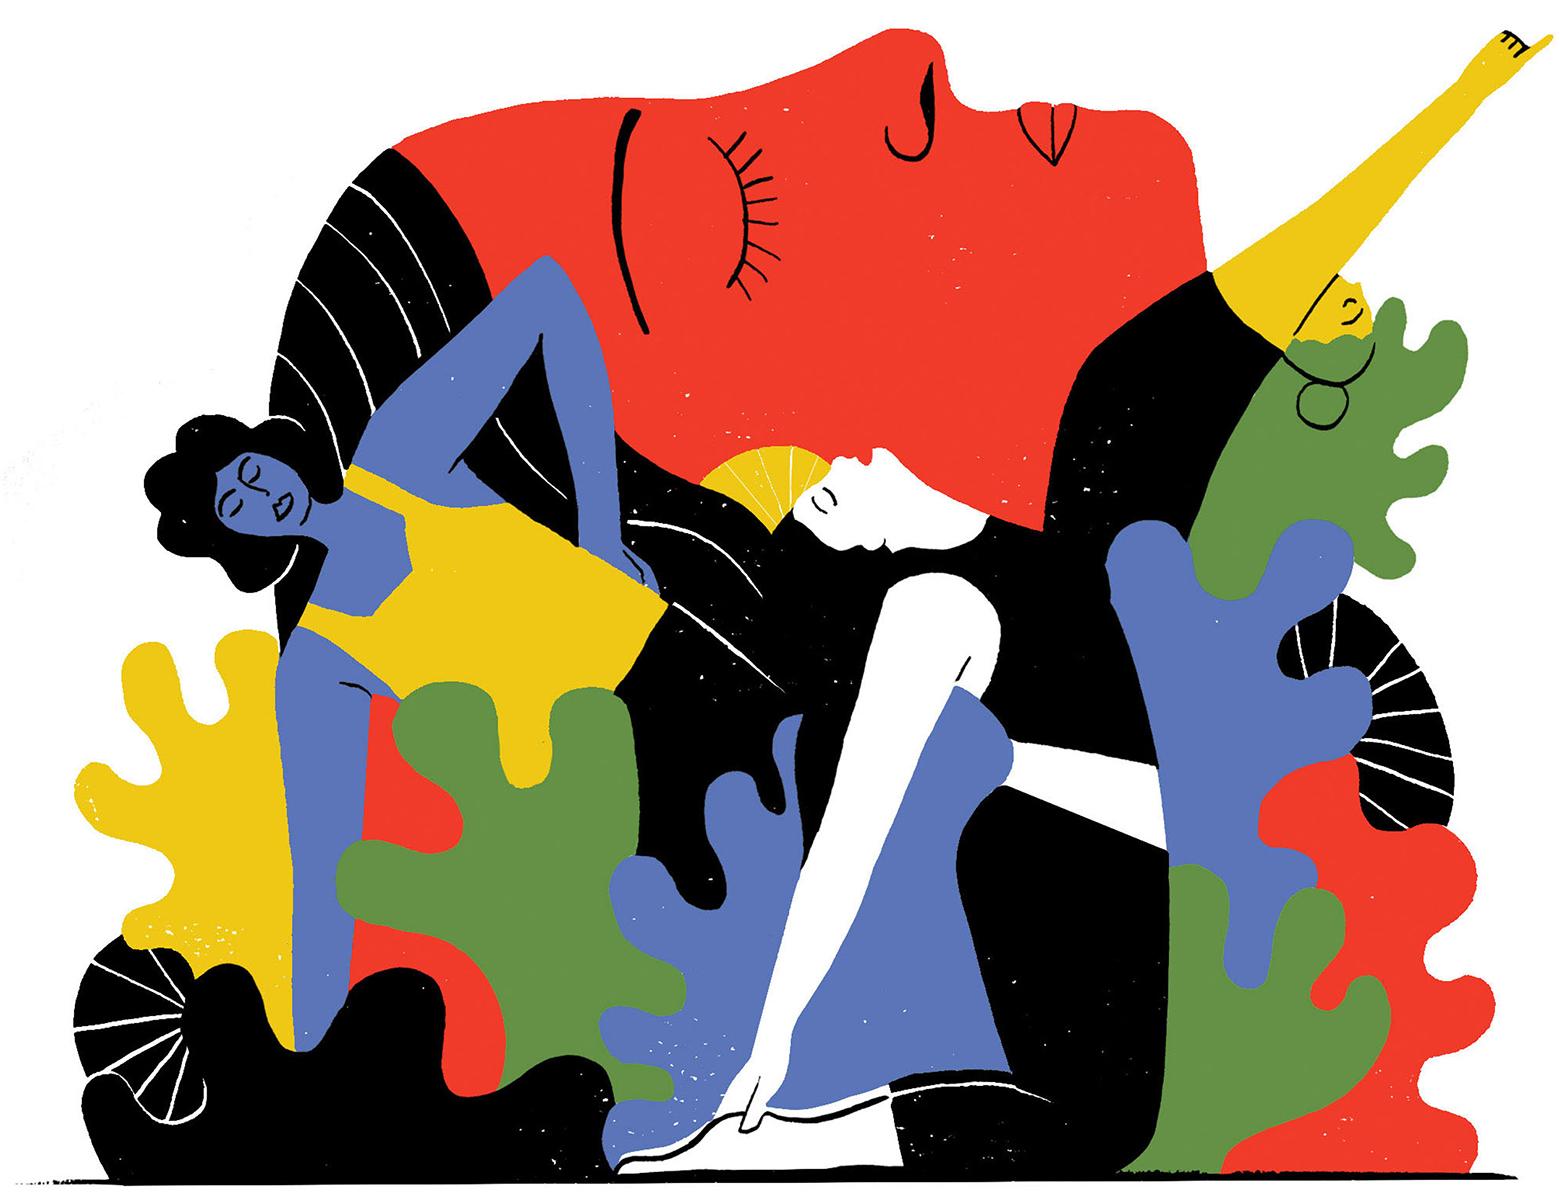 colorful health illustration of women doing yoga